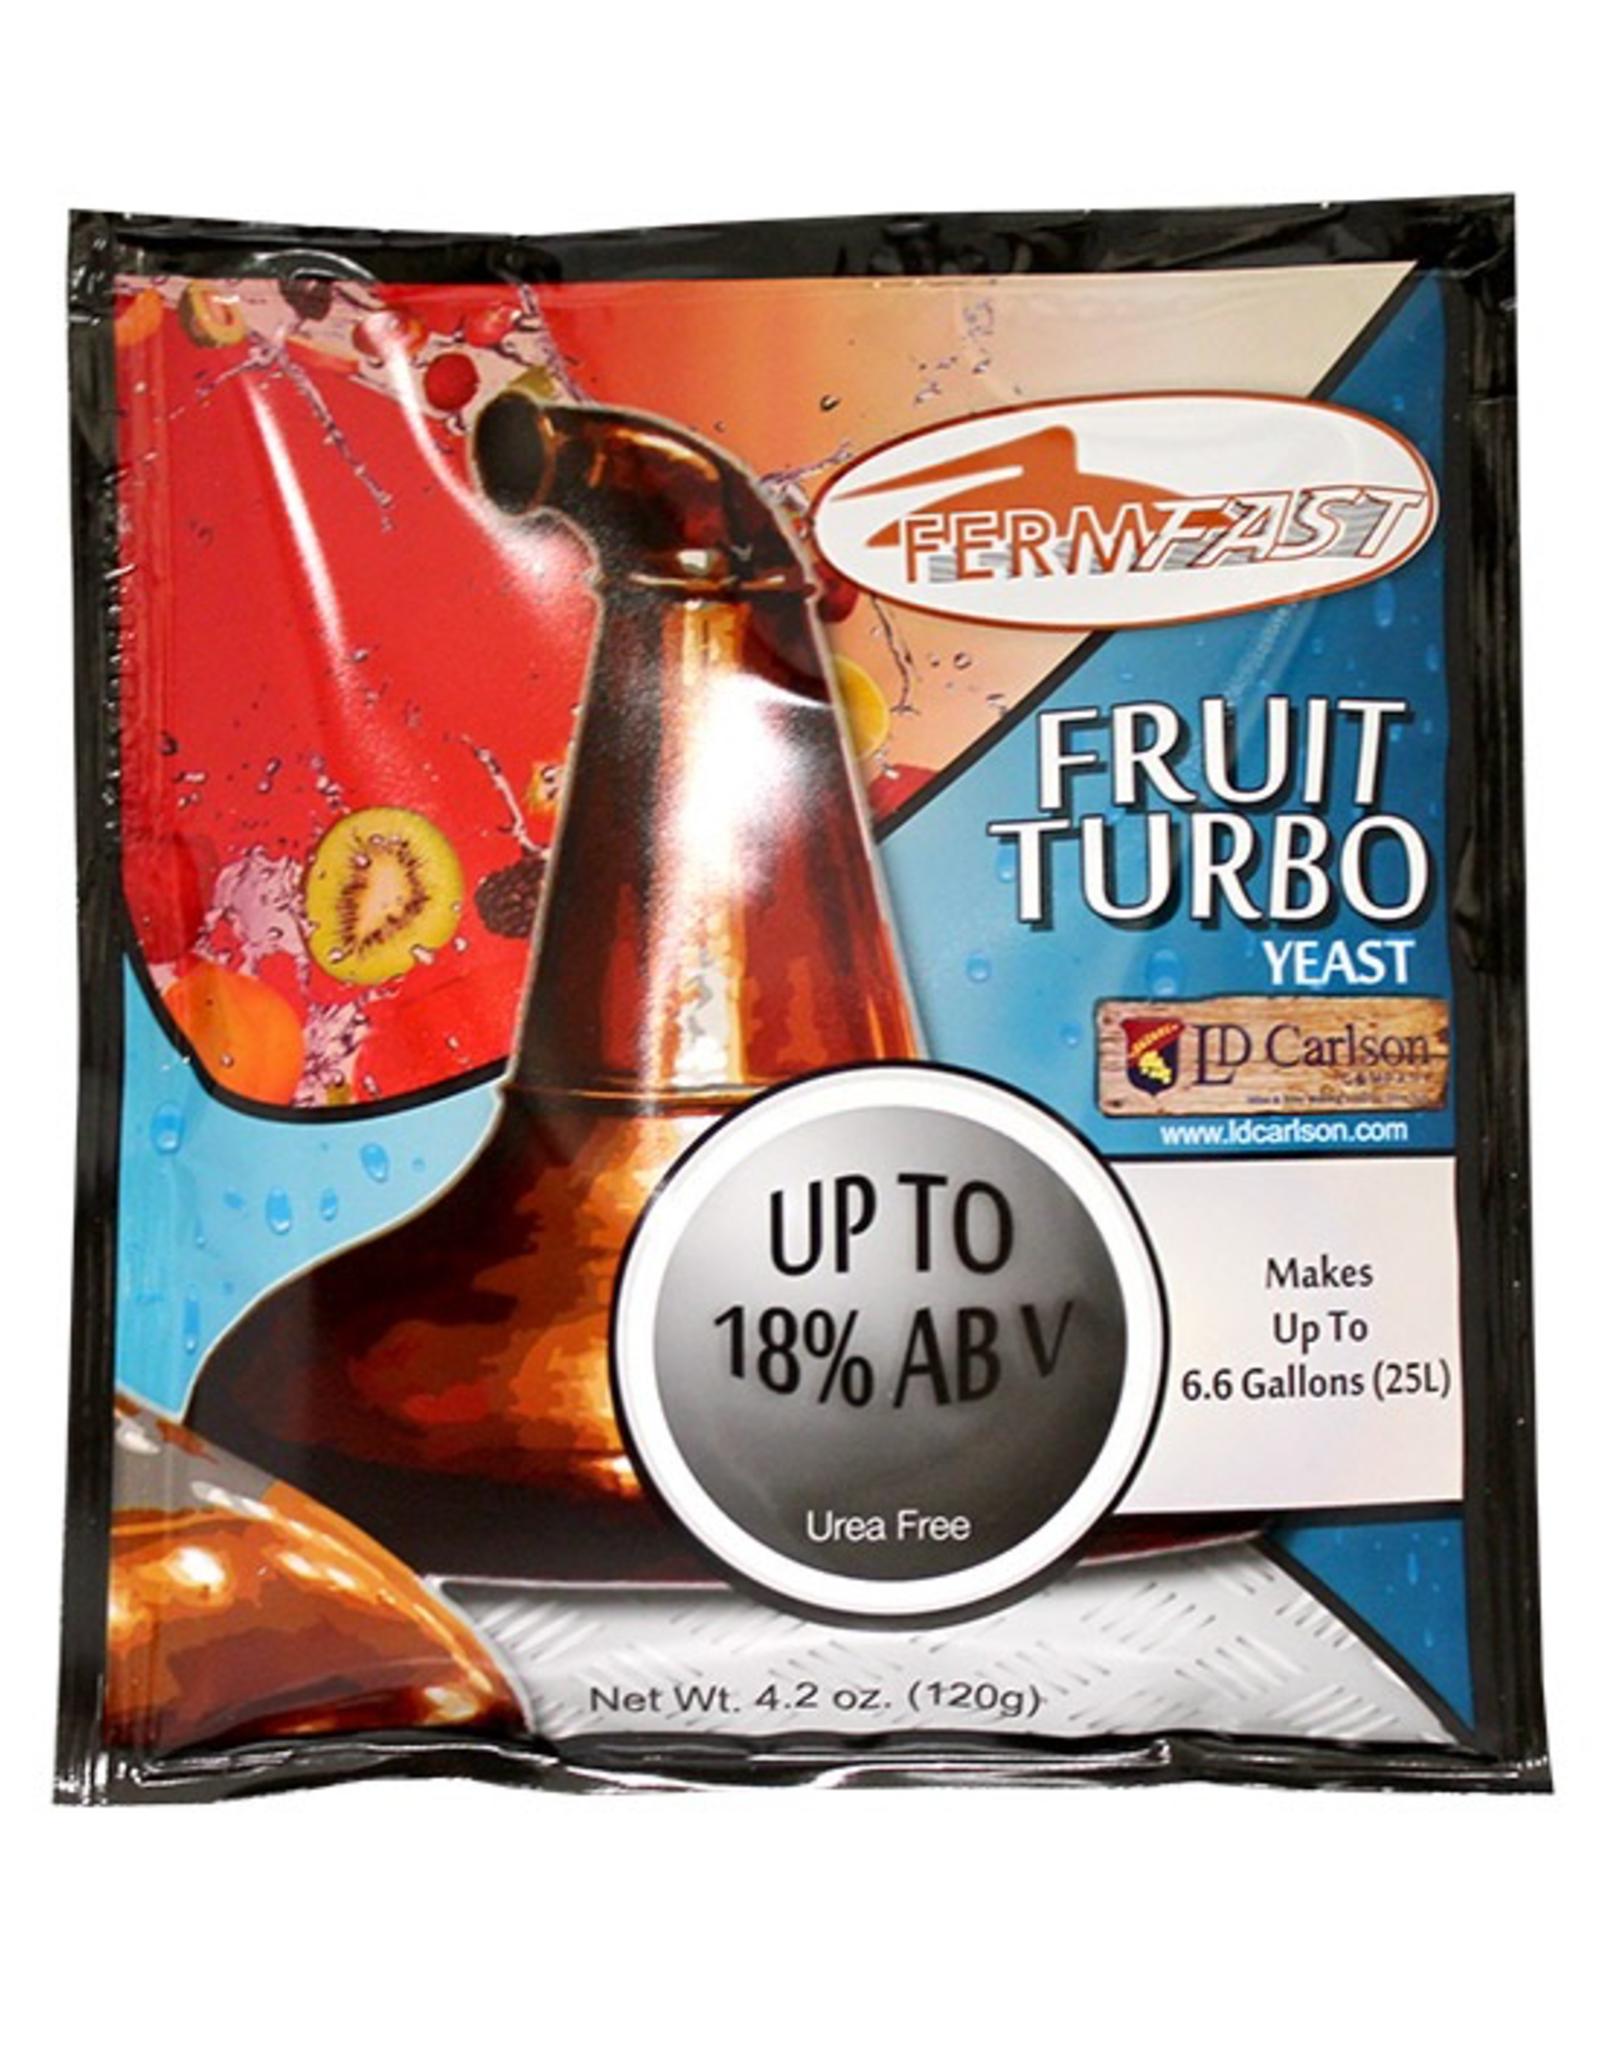 FERMFAST FERMFAST FRUIT TURBO YEAST 120 GRAM (UREA FREE)